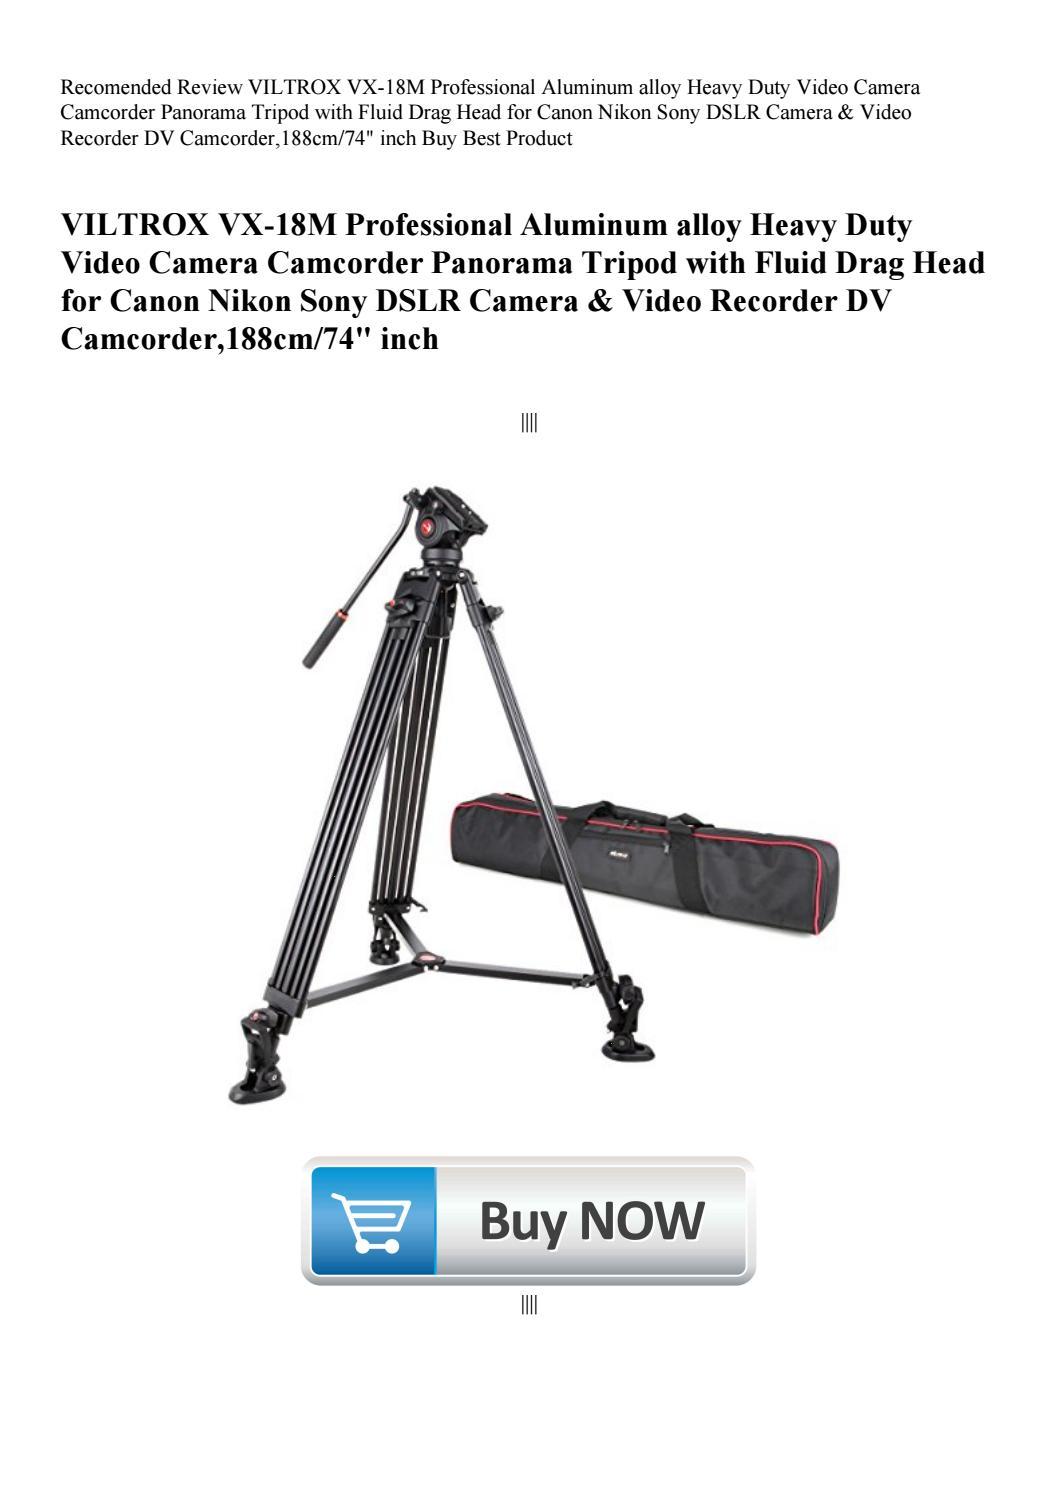 VILTROX VX-18M Professional Aluminum alloy Heavy Duty Video Camera Camcorder Panorama Tripod with Fluid Drag Head for Canon Nikon Sony DSLR Camera /& Video Recorder DV Camcorder,188cm//74 inch